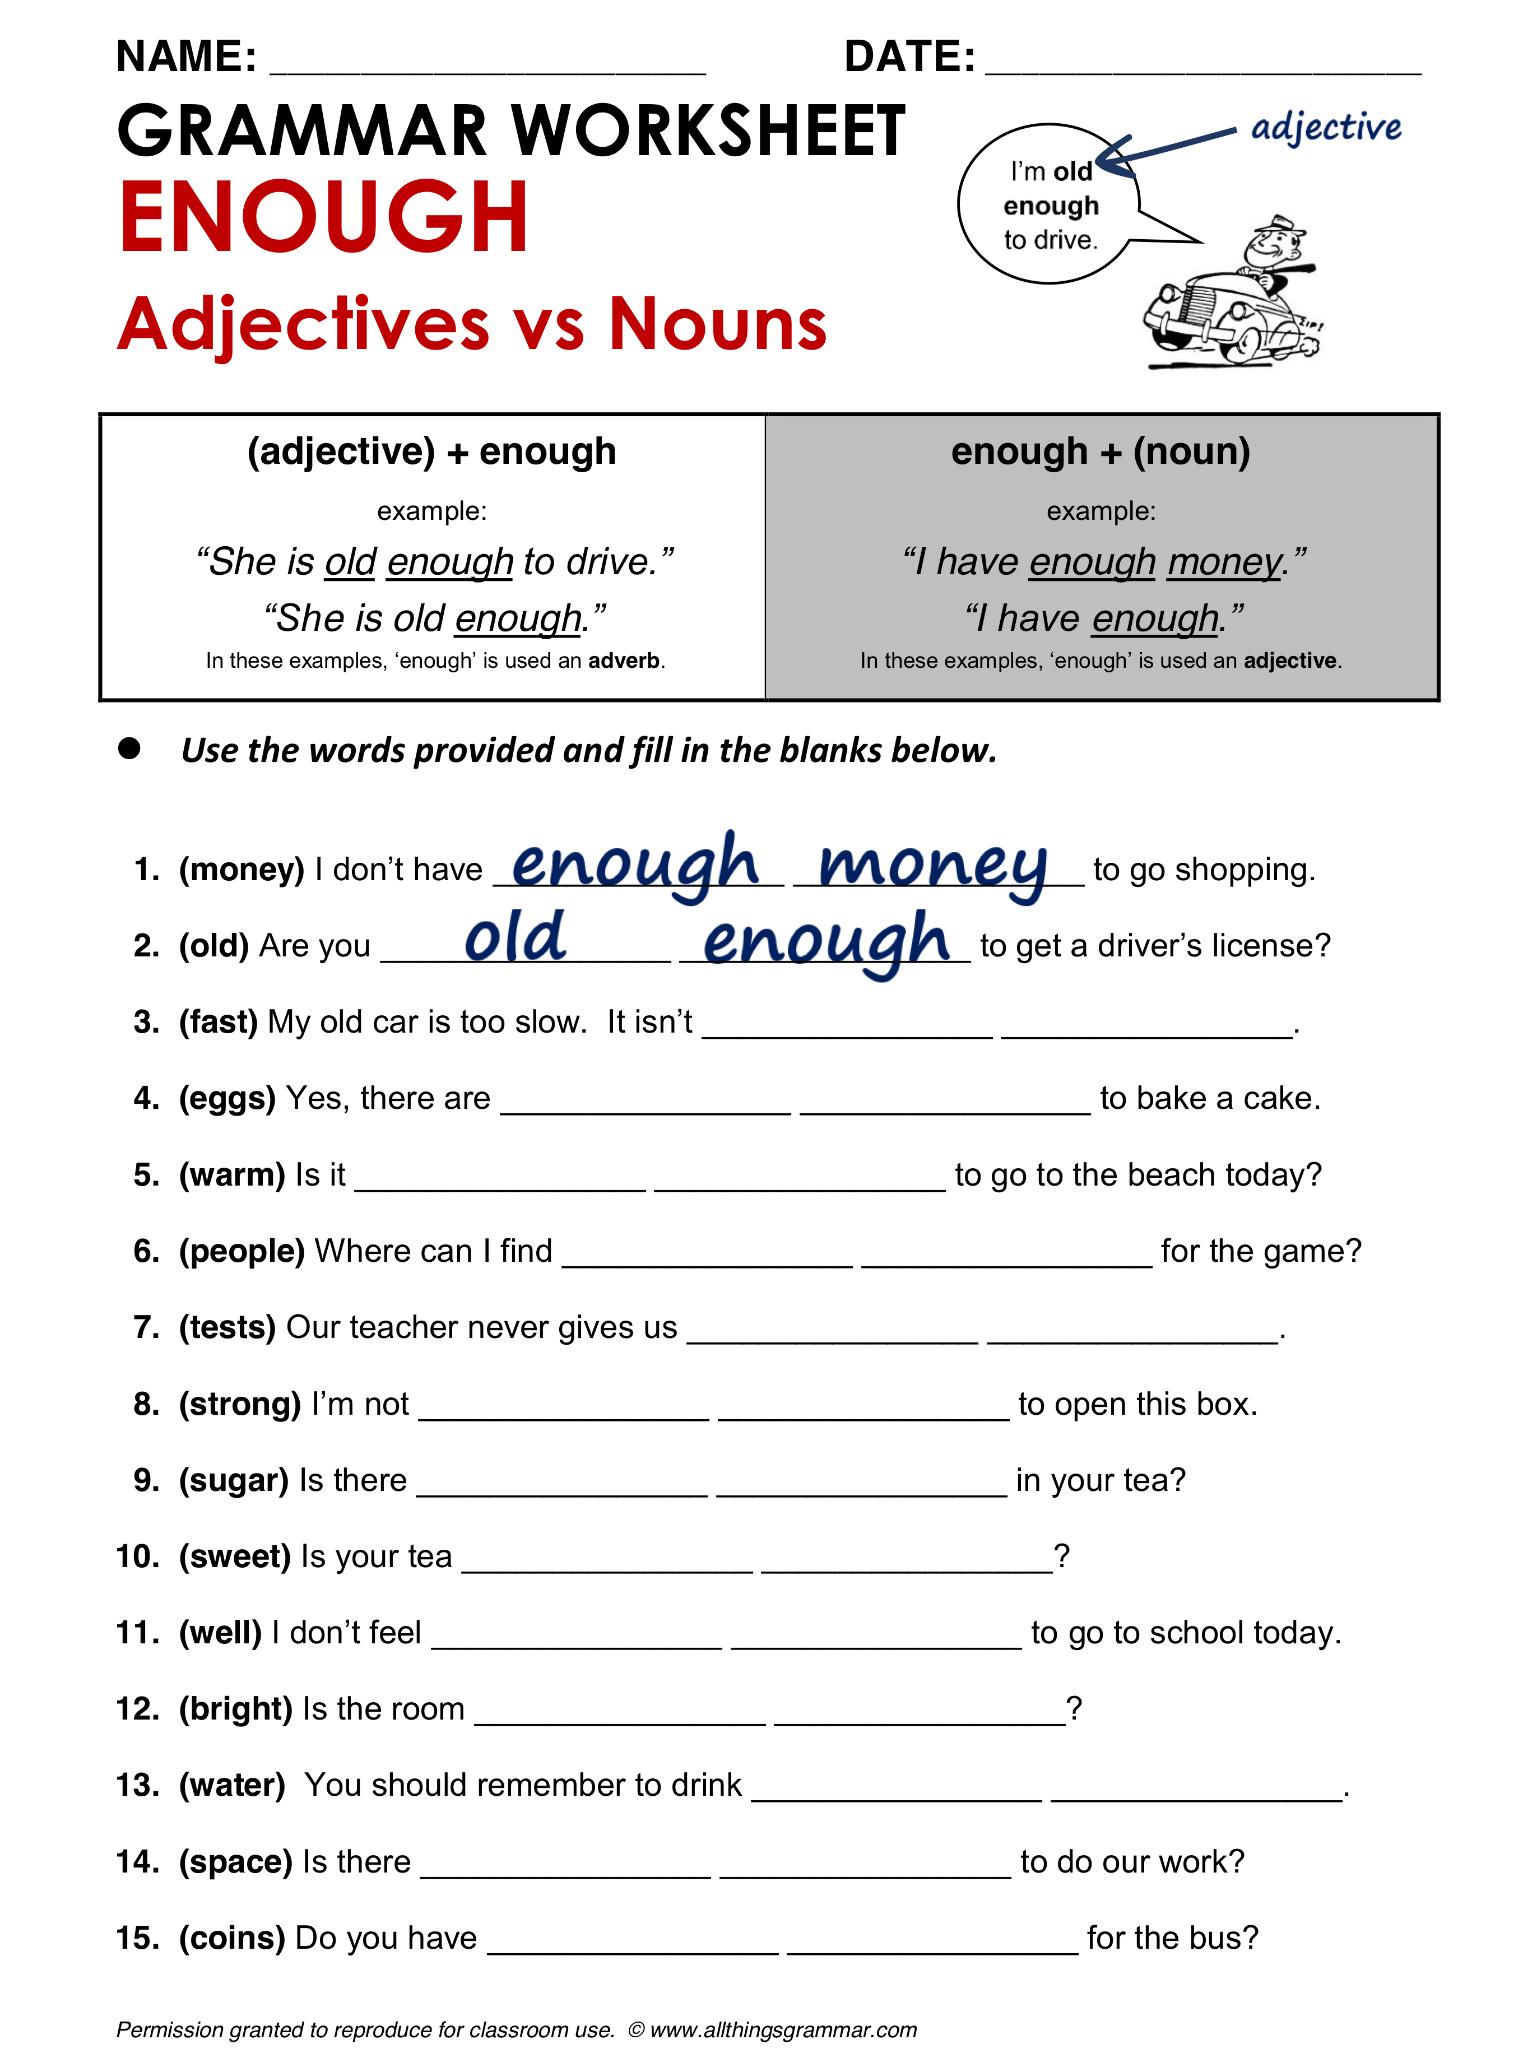 english grammar enough adjectives vs nouns www. Black Bedroom Furniture Sets. Home Design Ideas